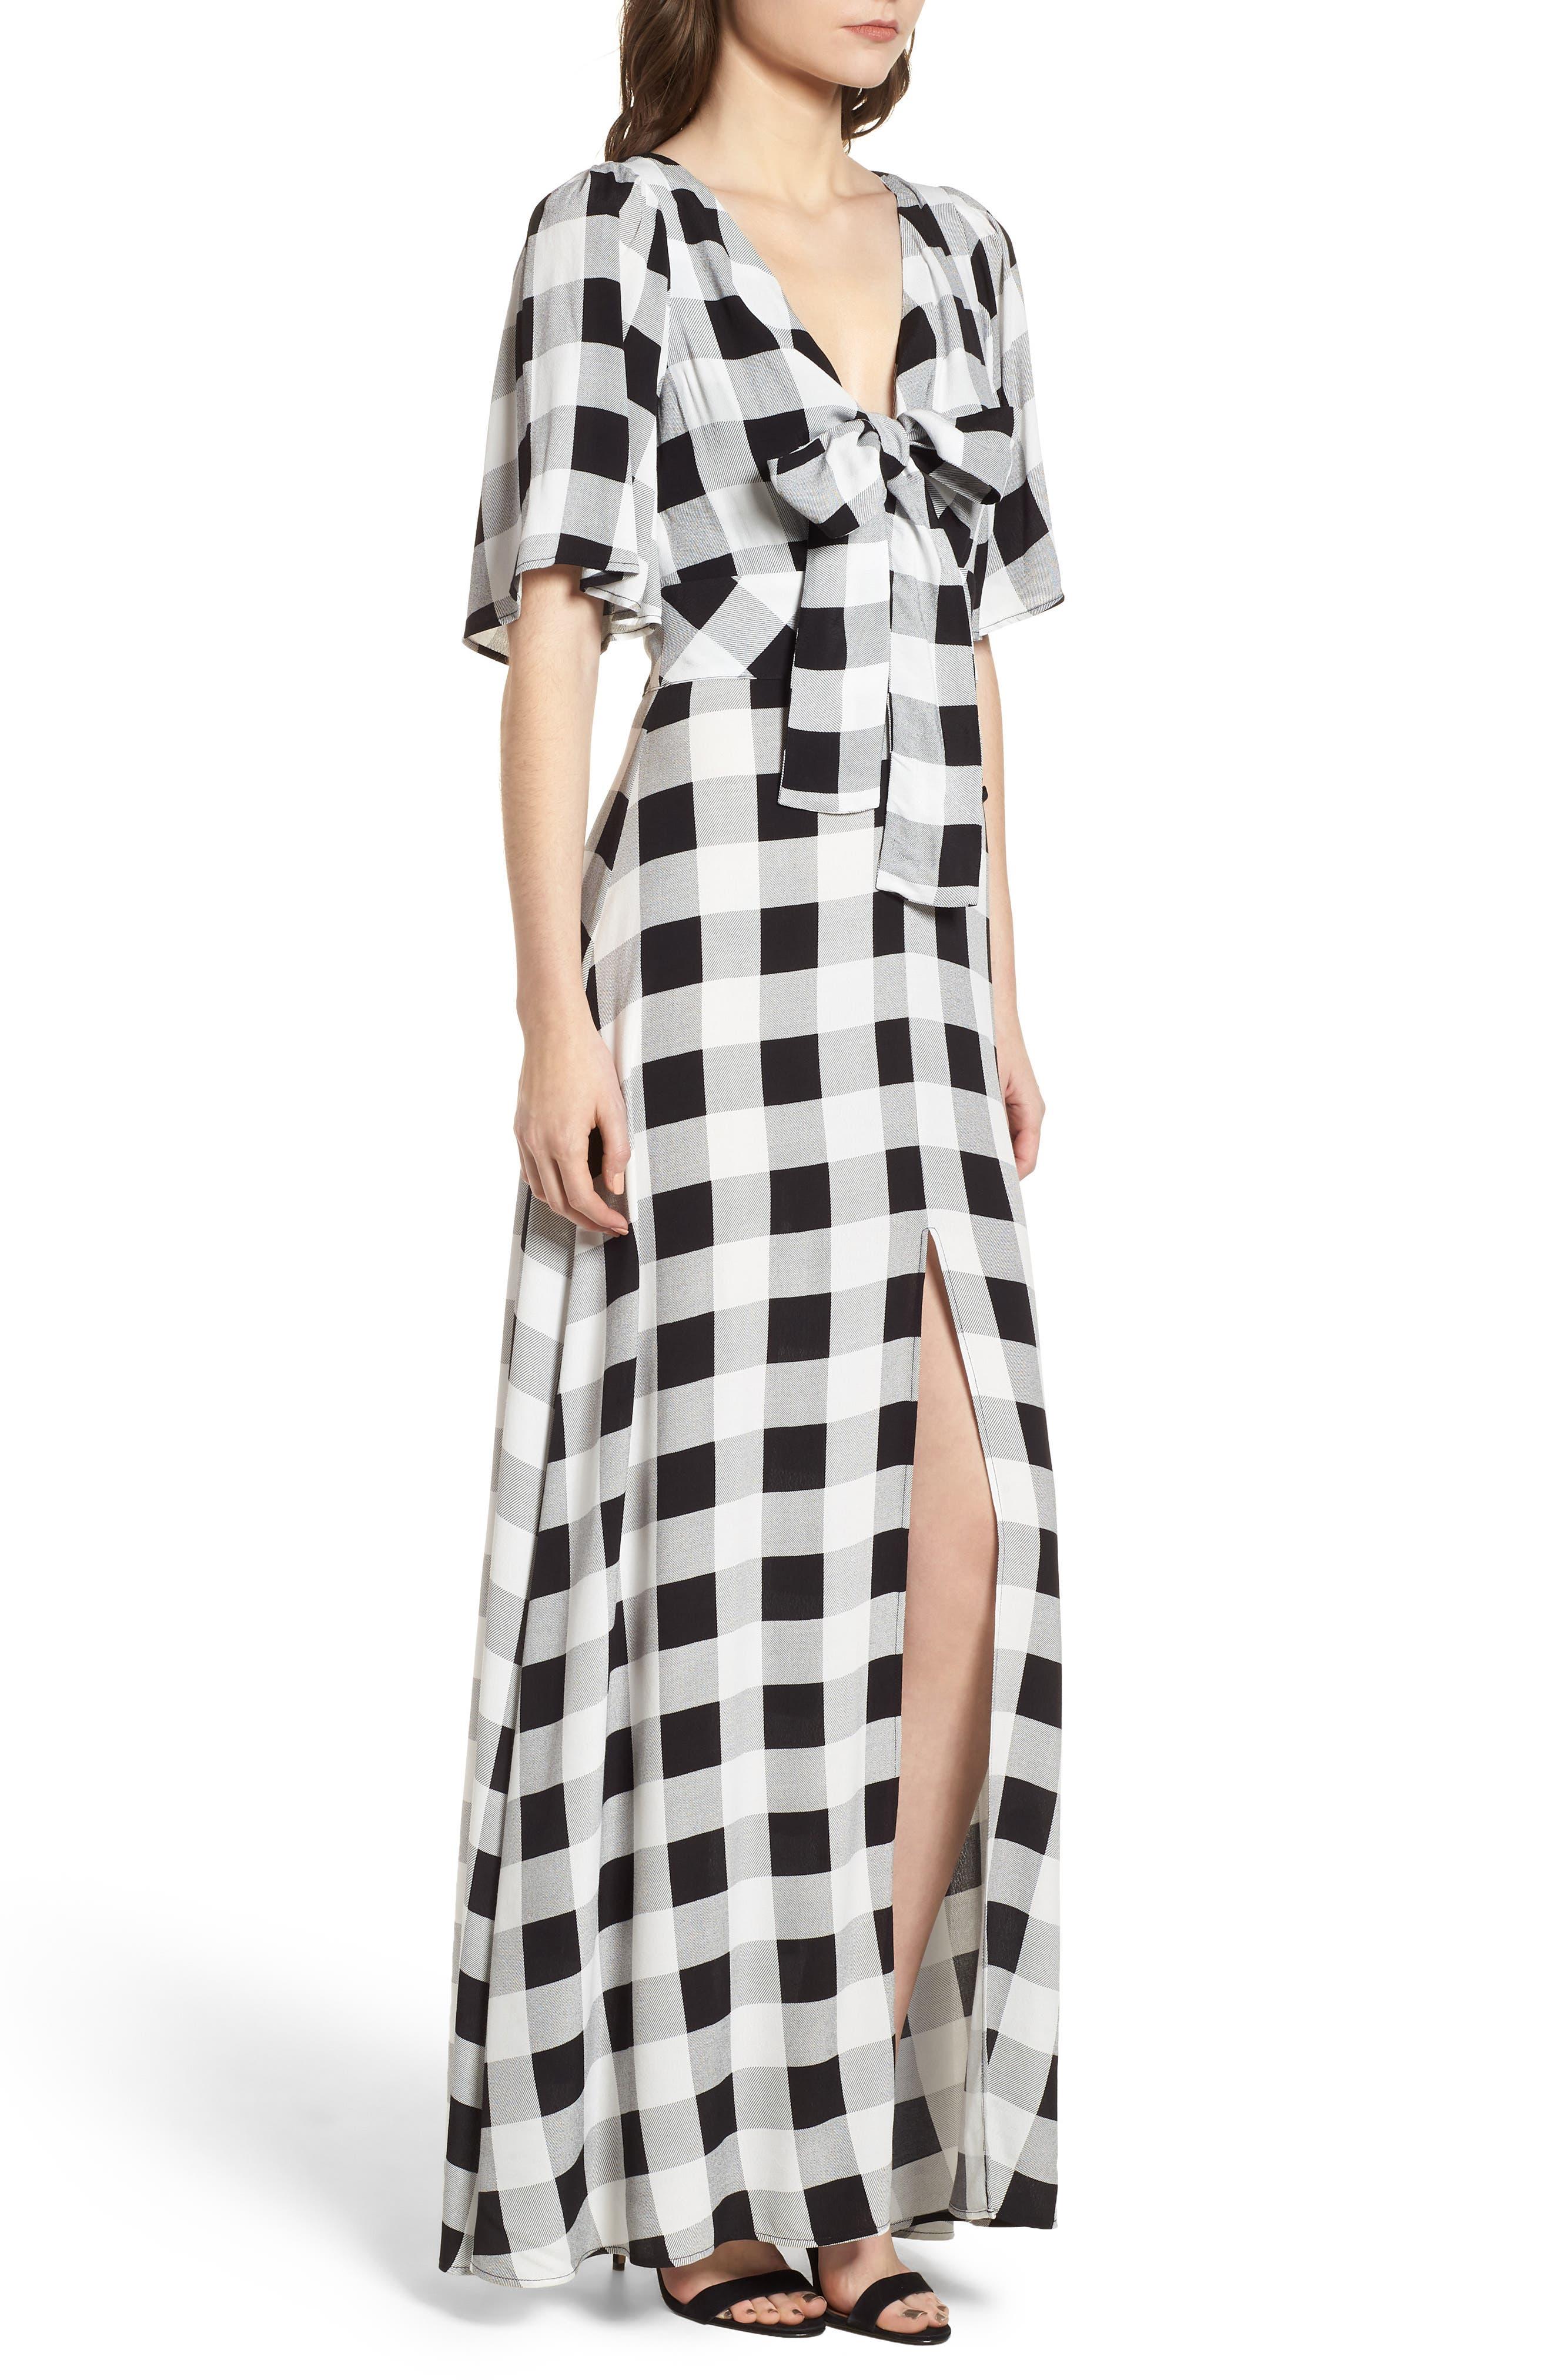 Ramon Tie Front Maxi Dress,                             Alternate thumbnail 3, color,                             Noir Blanc Gingham